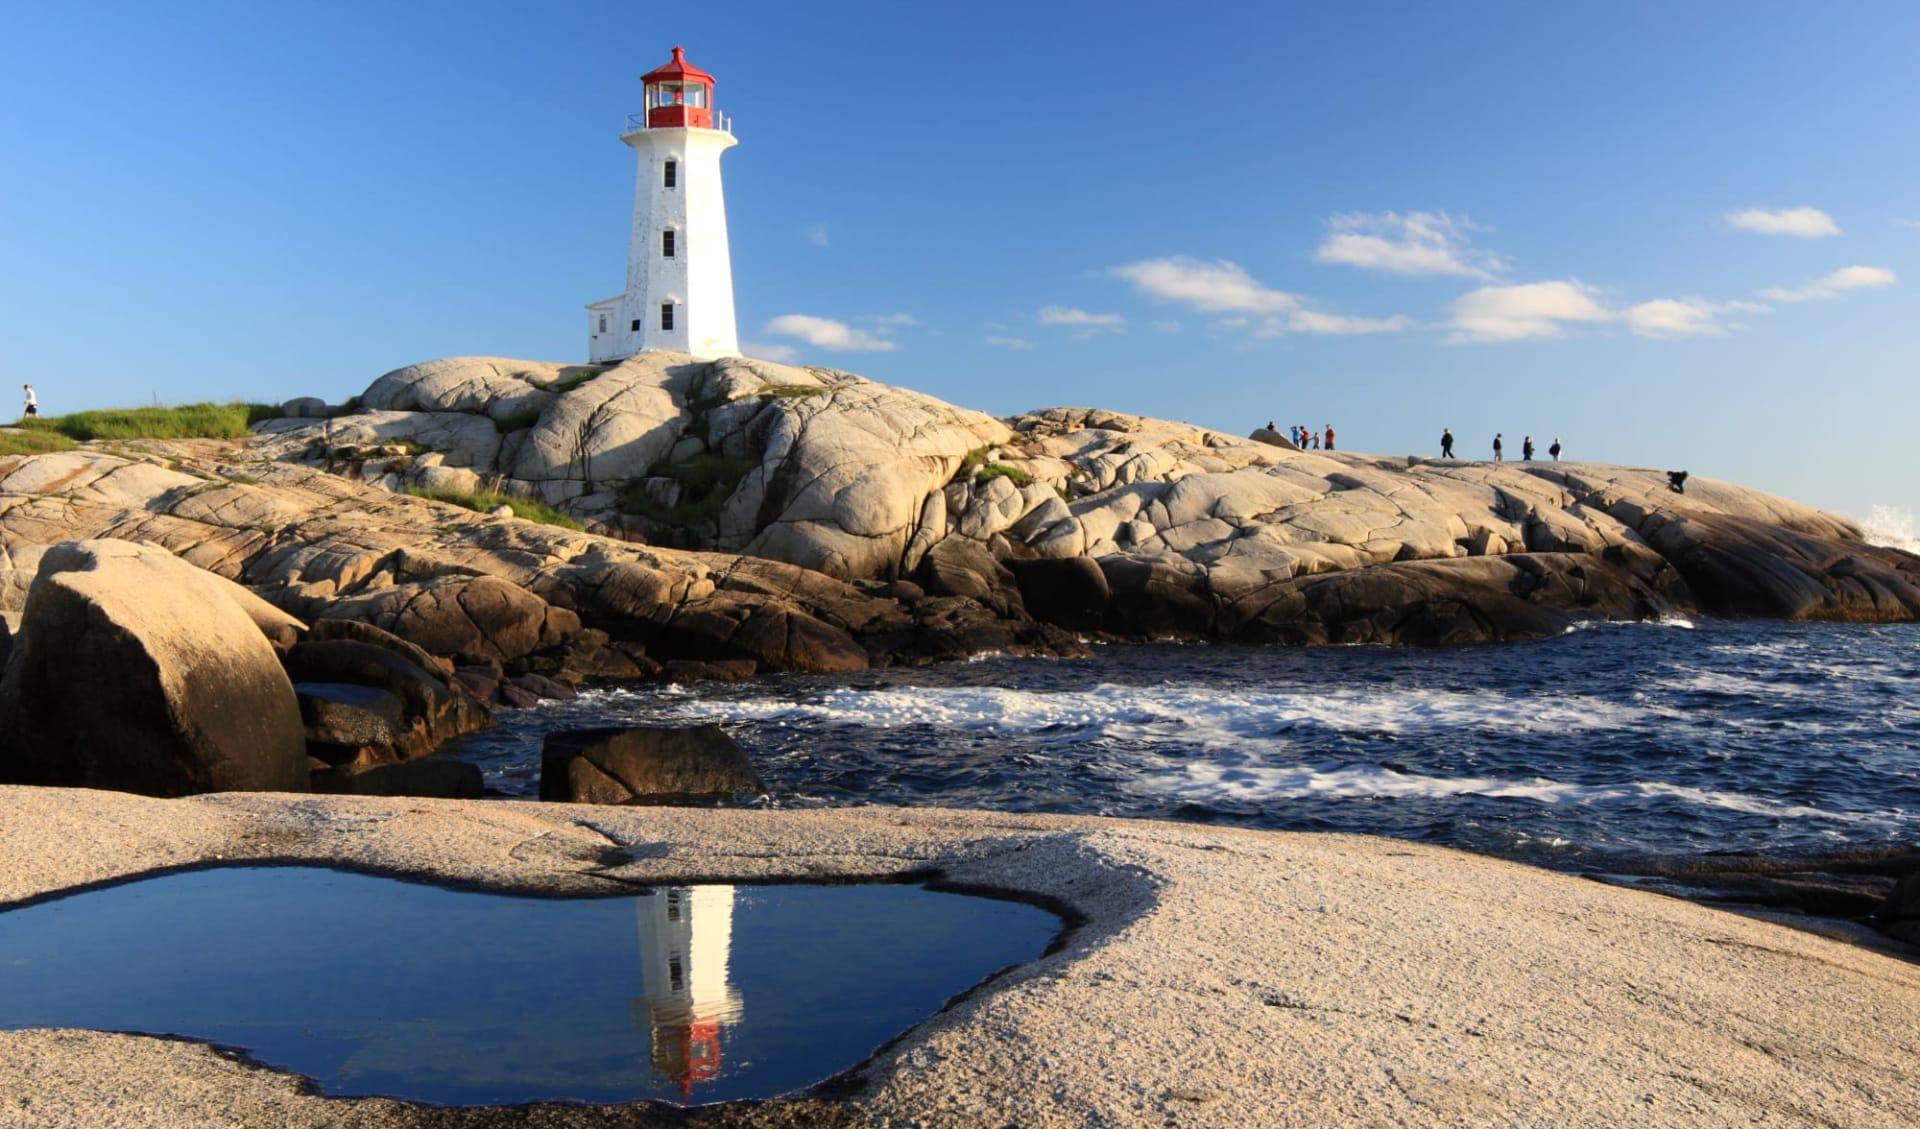 Auf den Spuren der Wikinger ab Halifax: Kanada - Nova Scotia - Peggys Cove Lighthouse